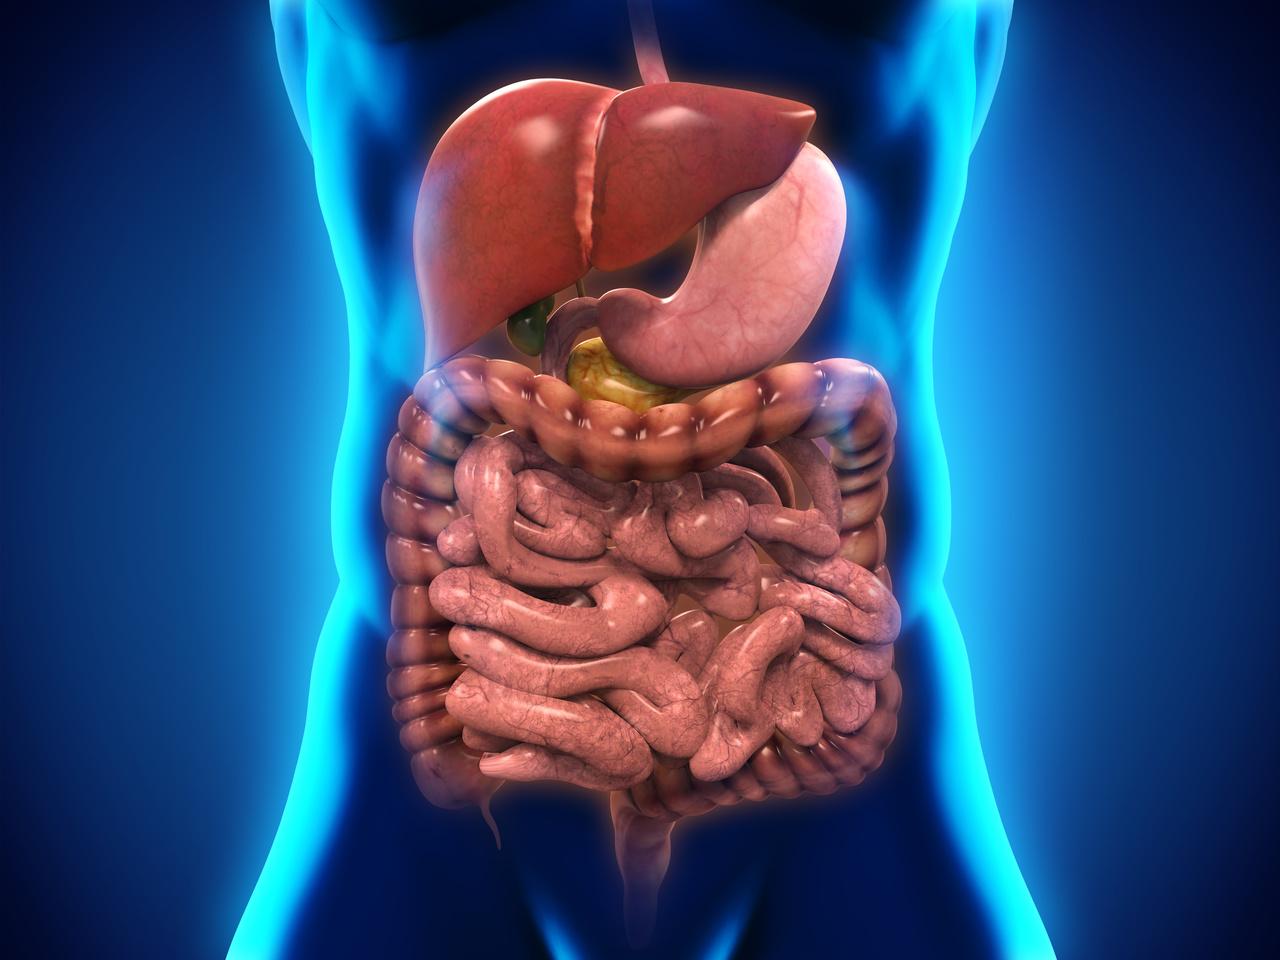 Two Studies Report Results of Vedolizumab, Adalimumab, Ustekinumab for Ulcerative Colitis